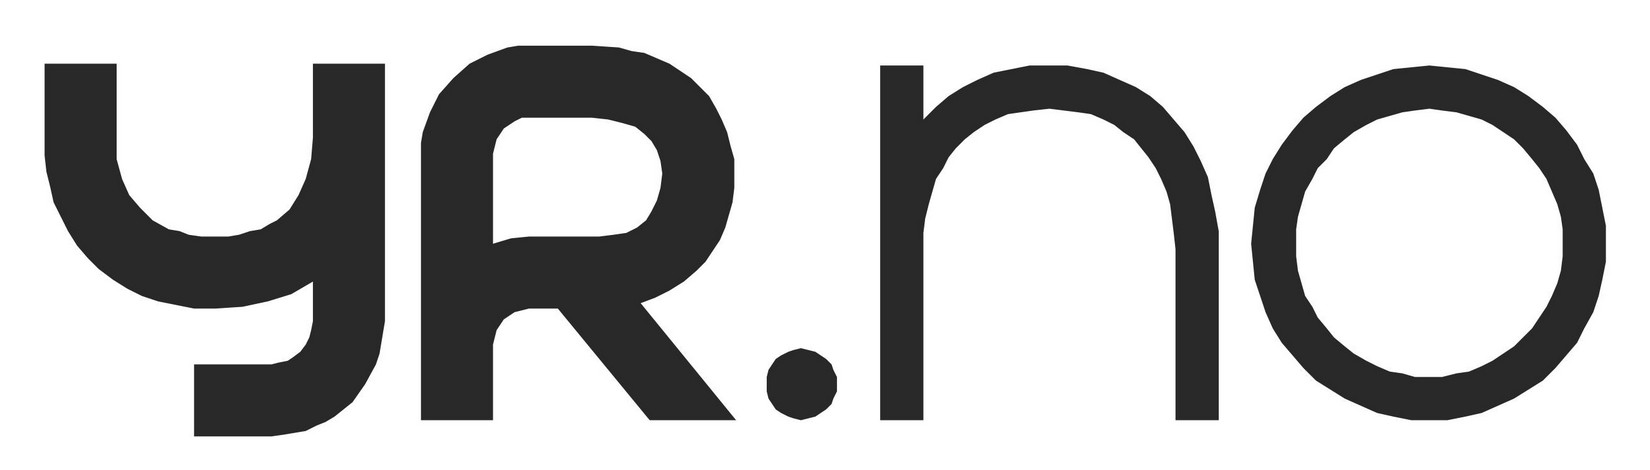 yr.no Logo png